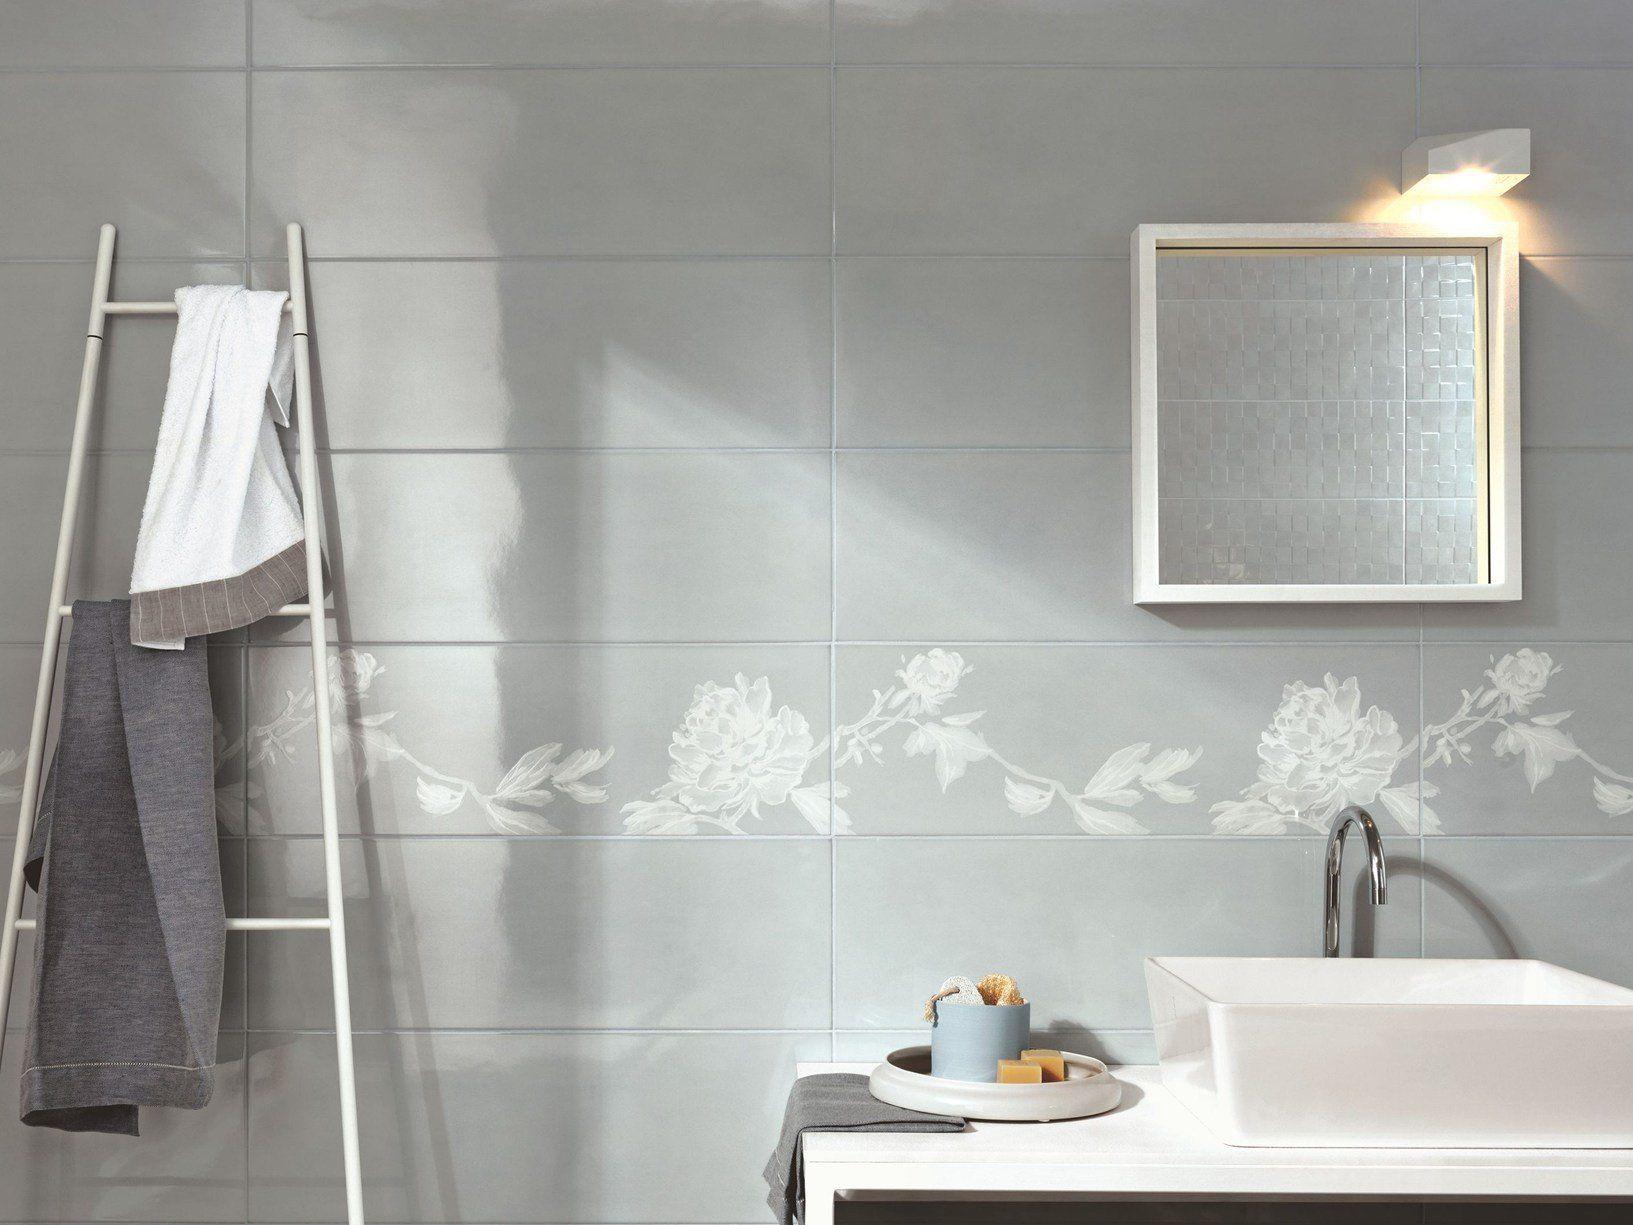 Ragno interpreta l 39 ambiente bagno con handmade for Carrelages muraux